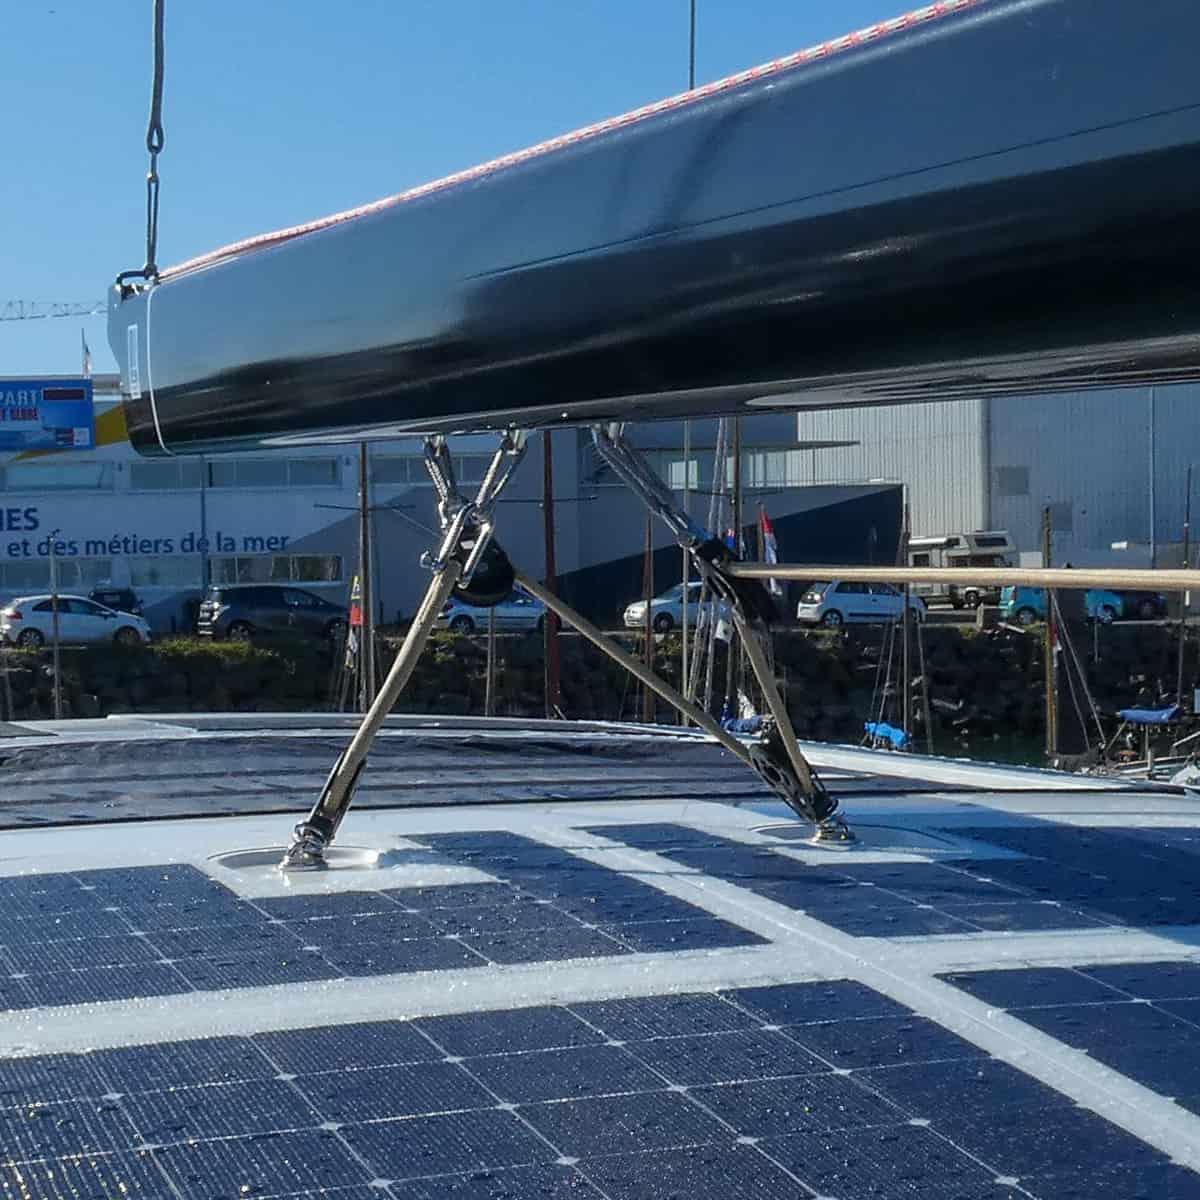 Solbian solar Beneteau Yacht 62 walkable deck hardtop solar panel